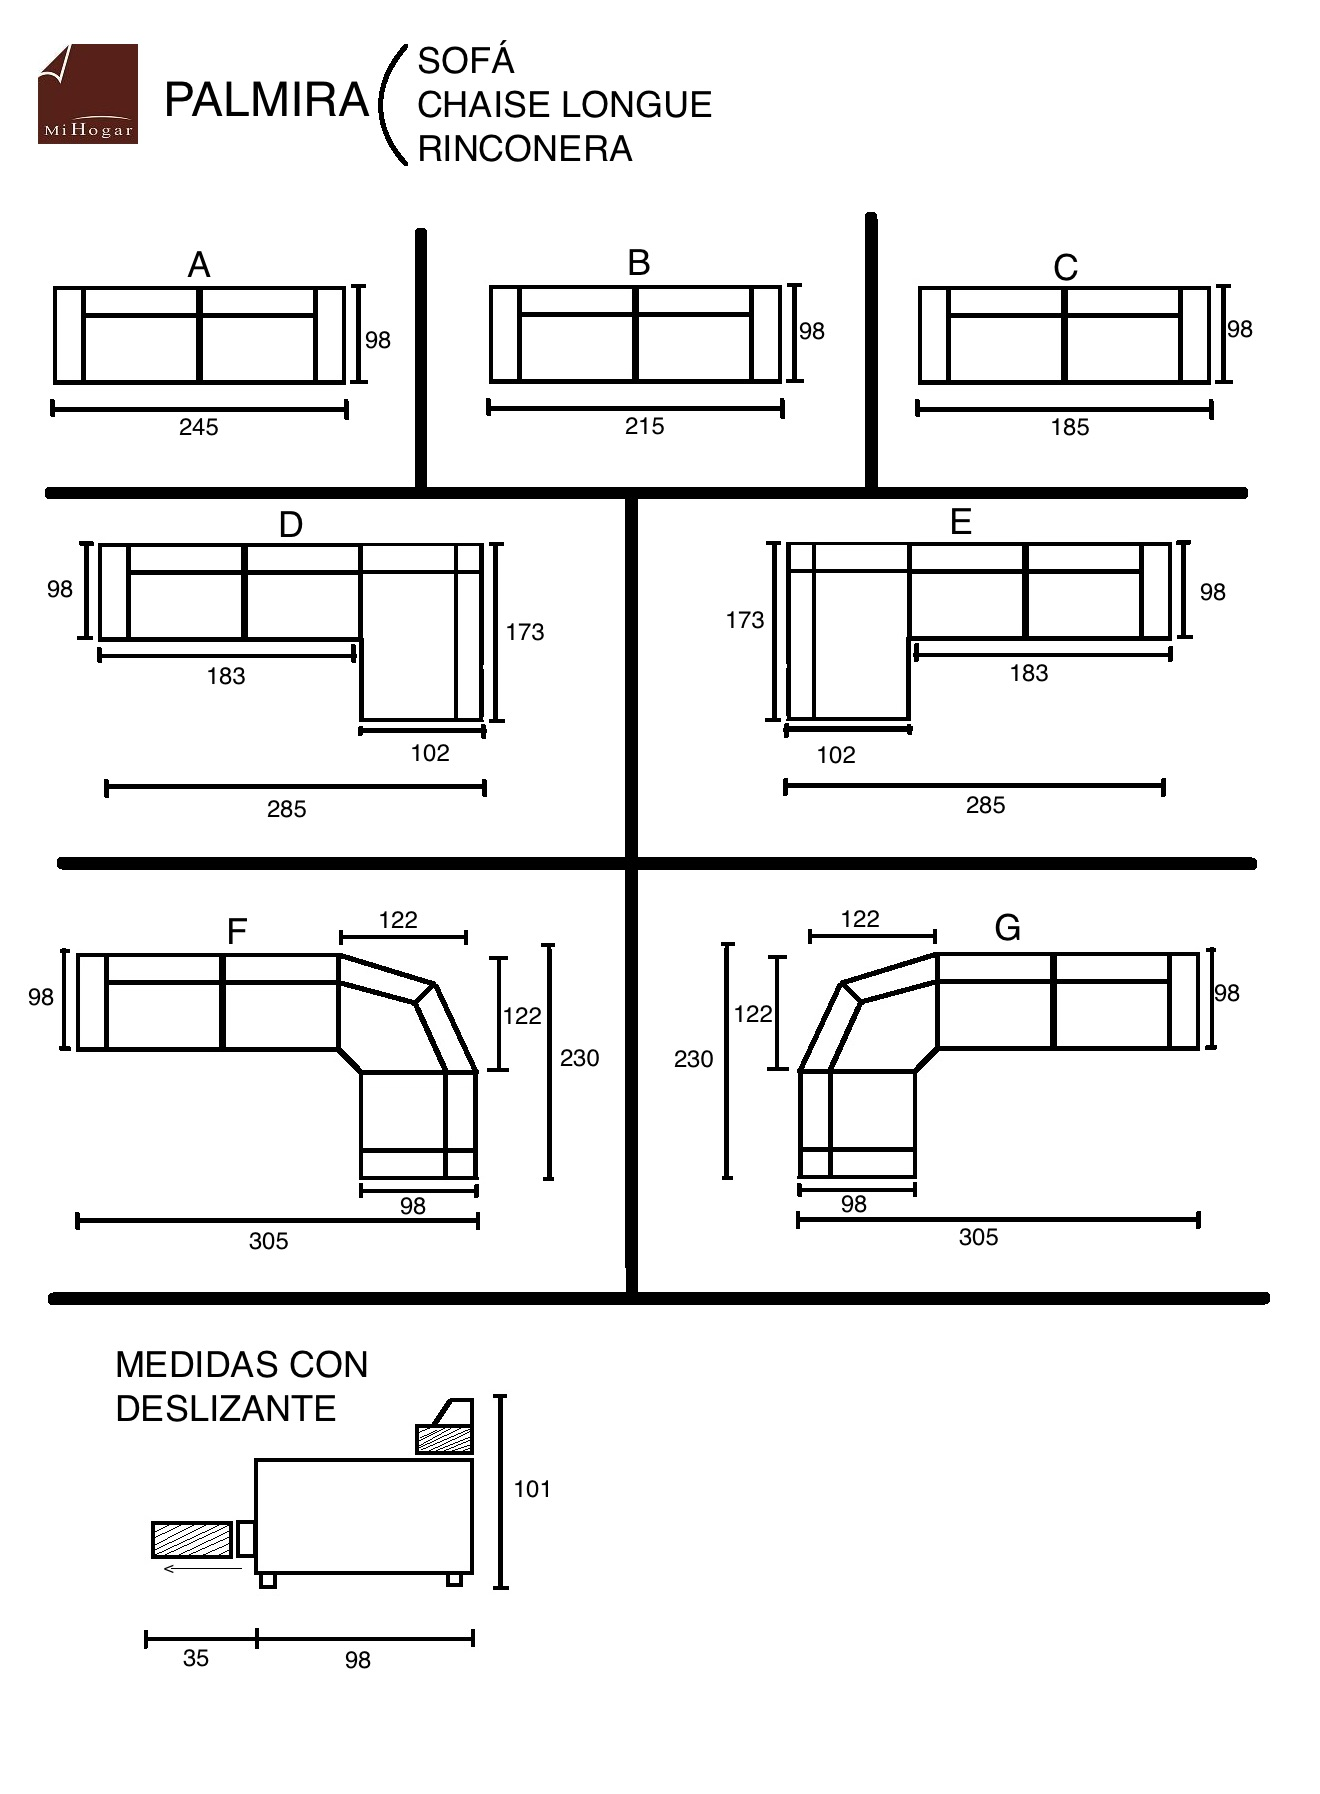 Chaise longue rinconera palmira muebles mi hogar for Medidas sofa 3 plazas